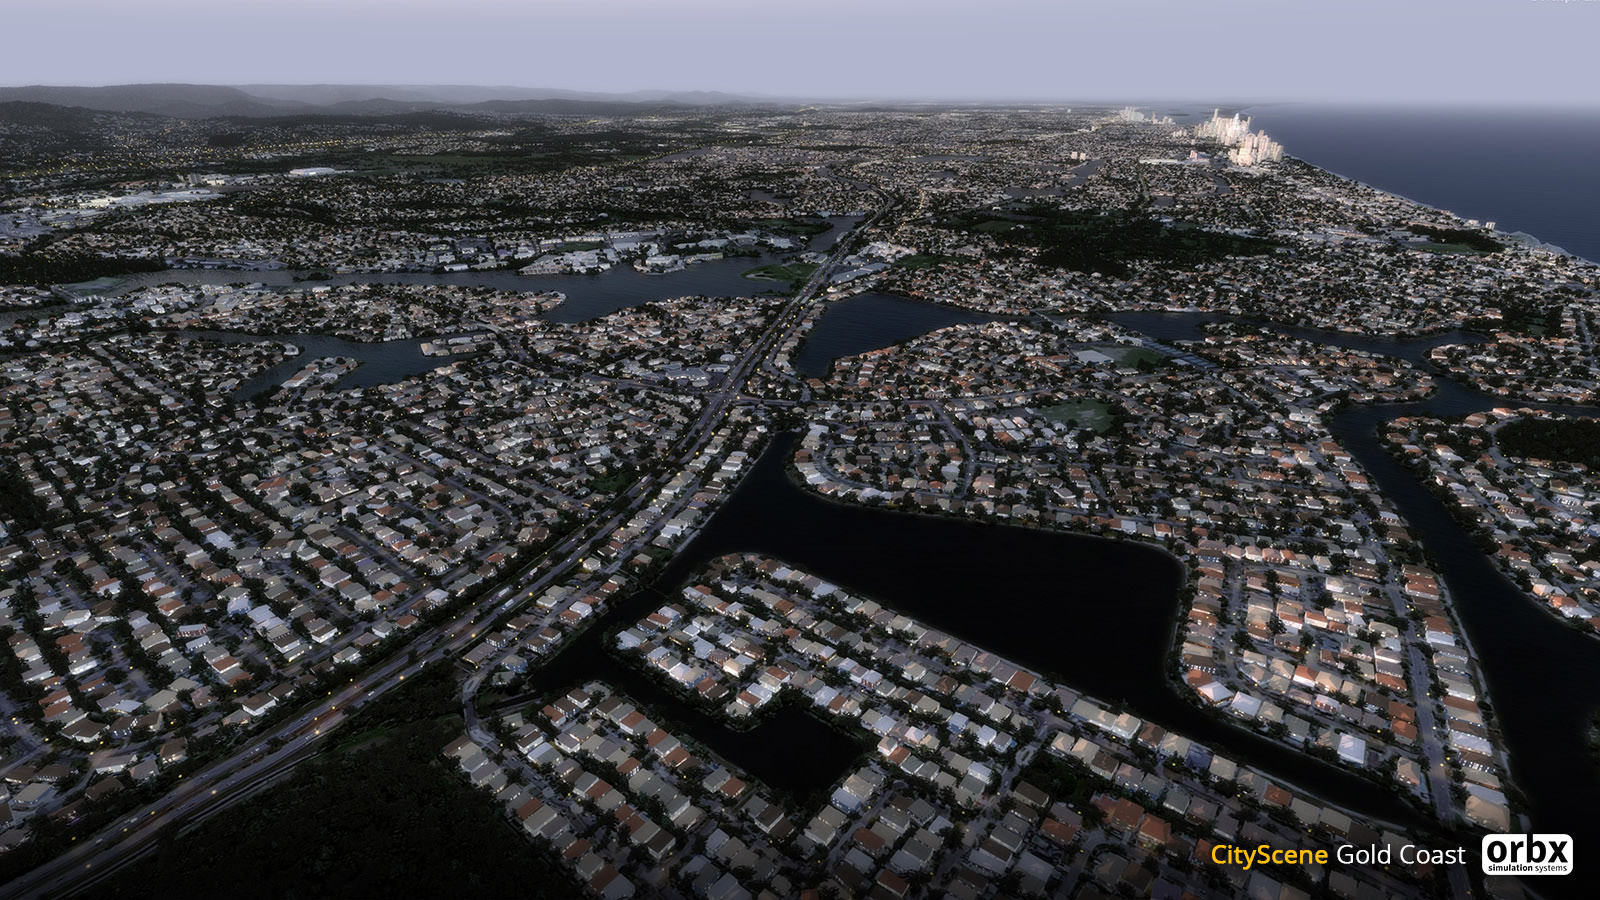 CityScene Gold Coast